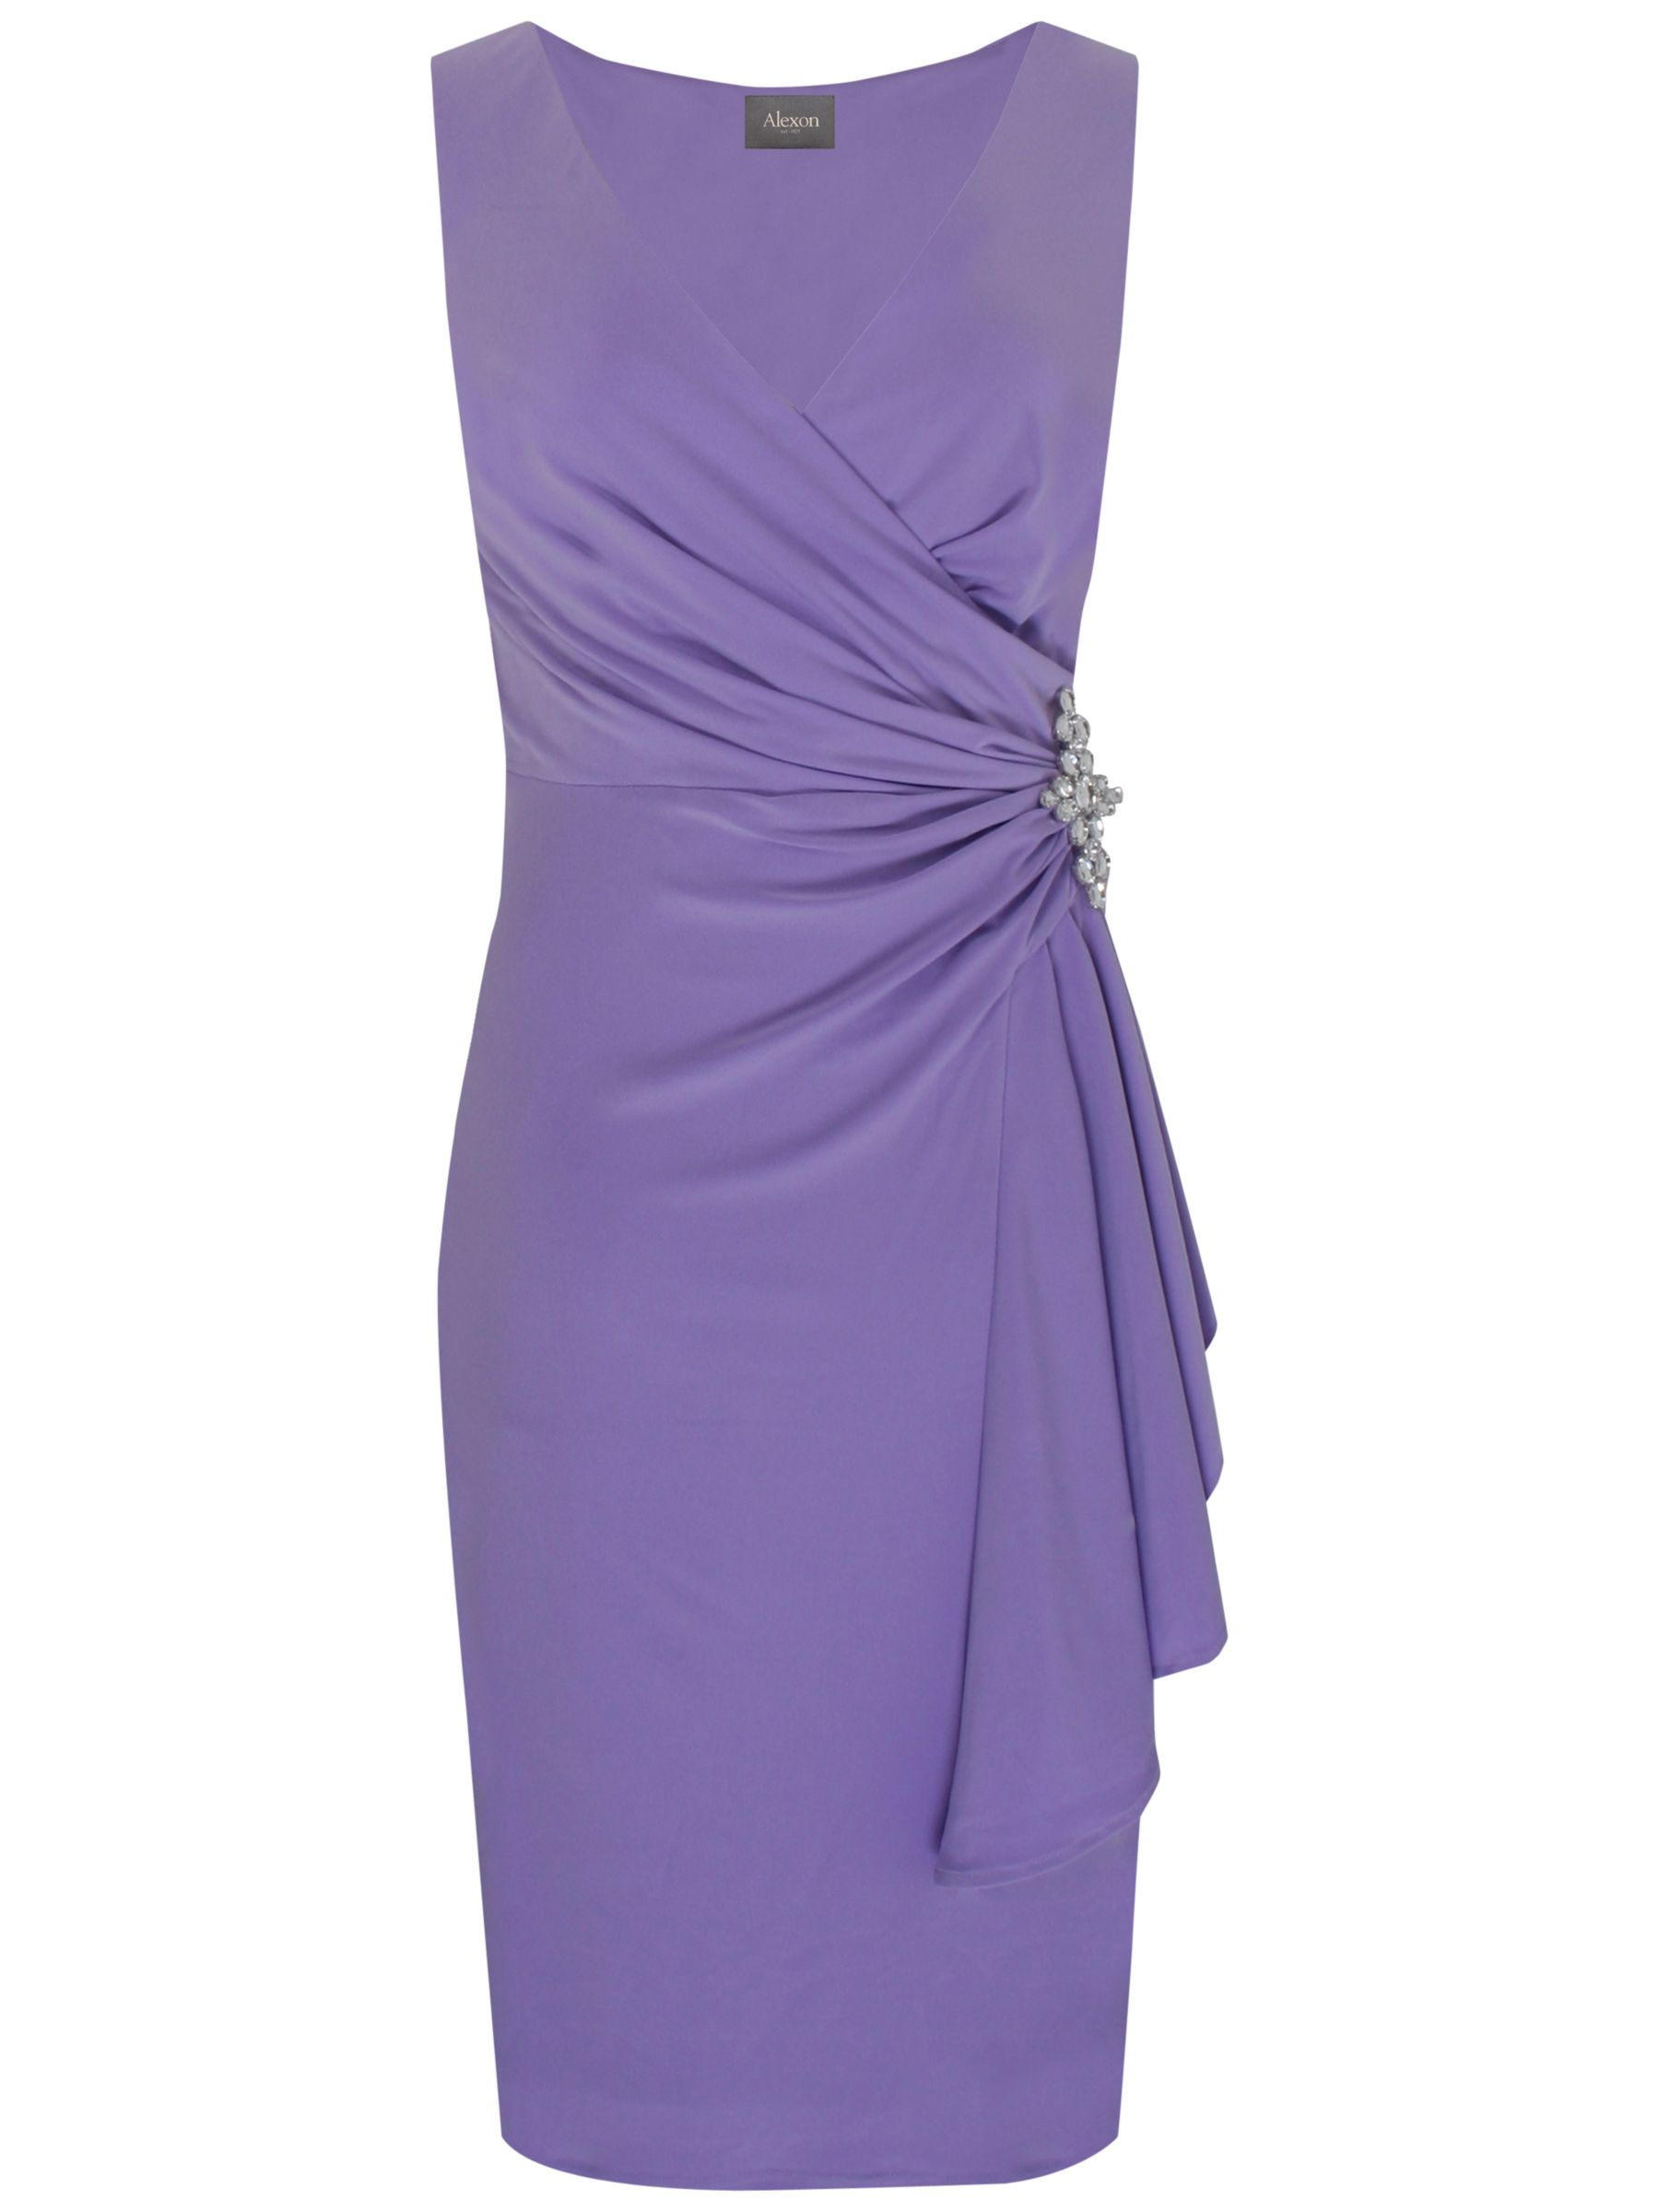 Alexon Entry Jersey Dress, Perfume